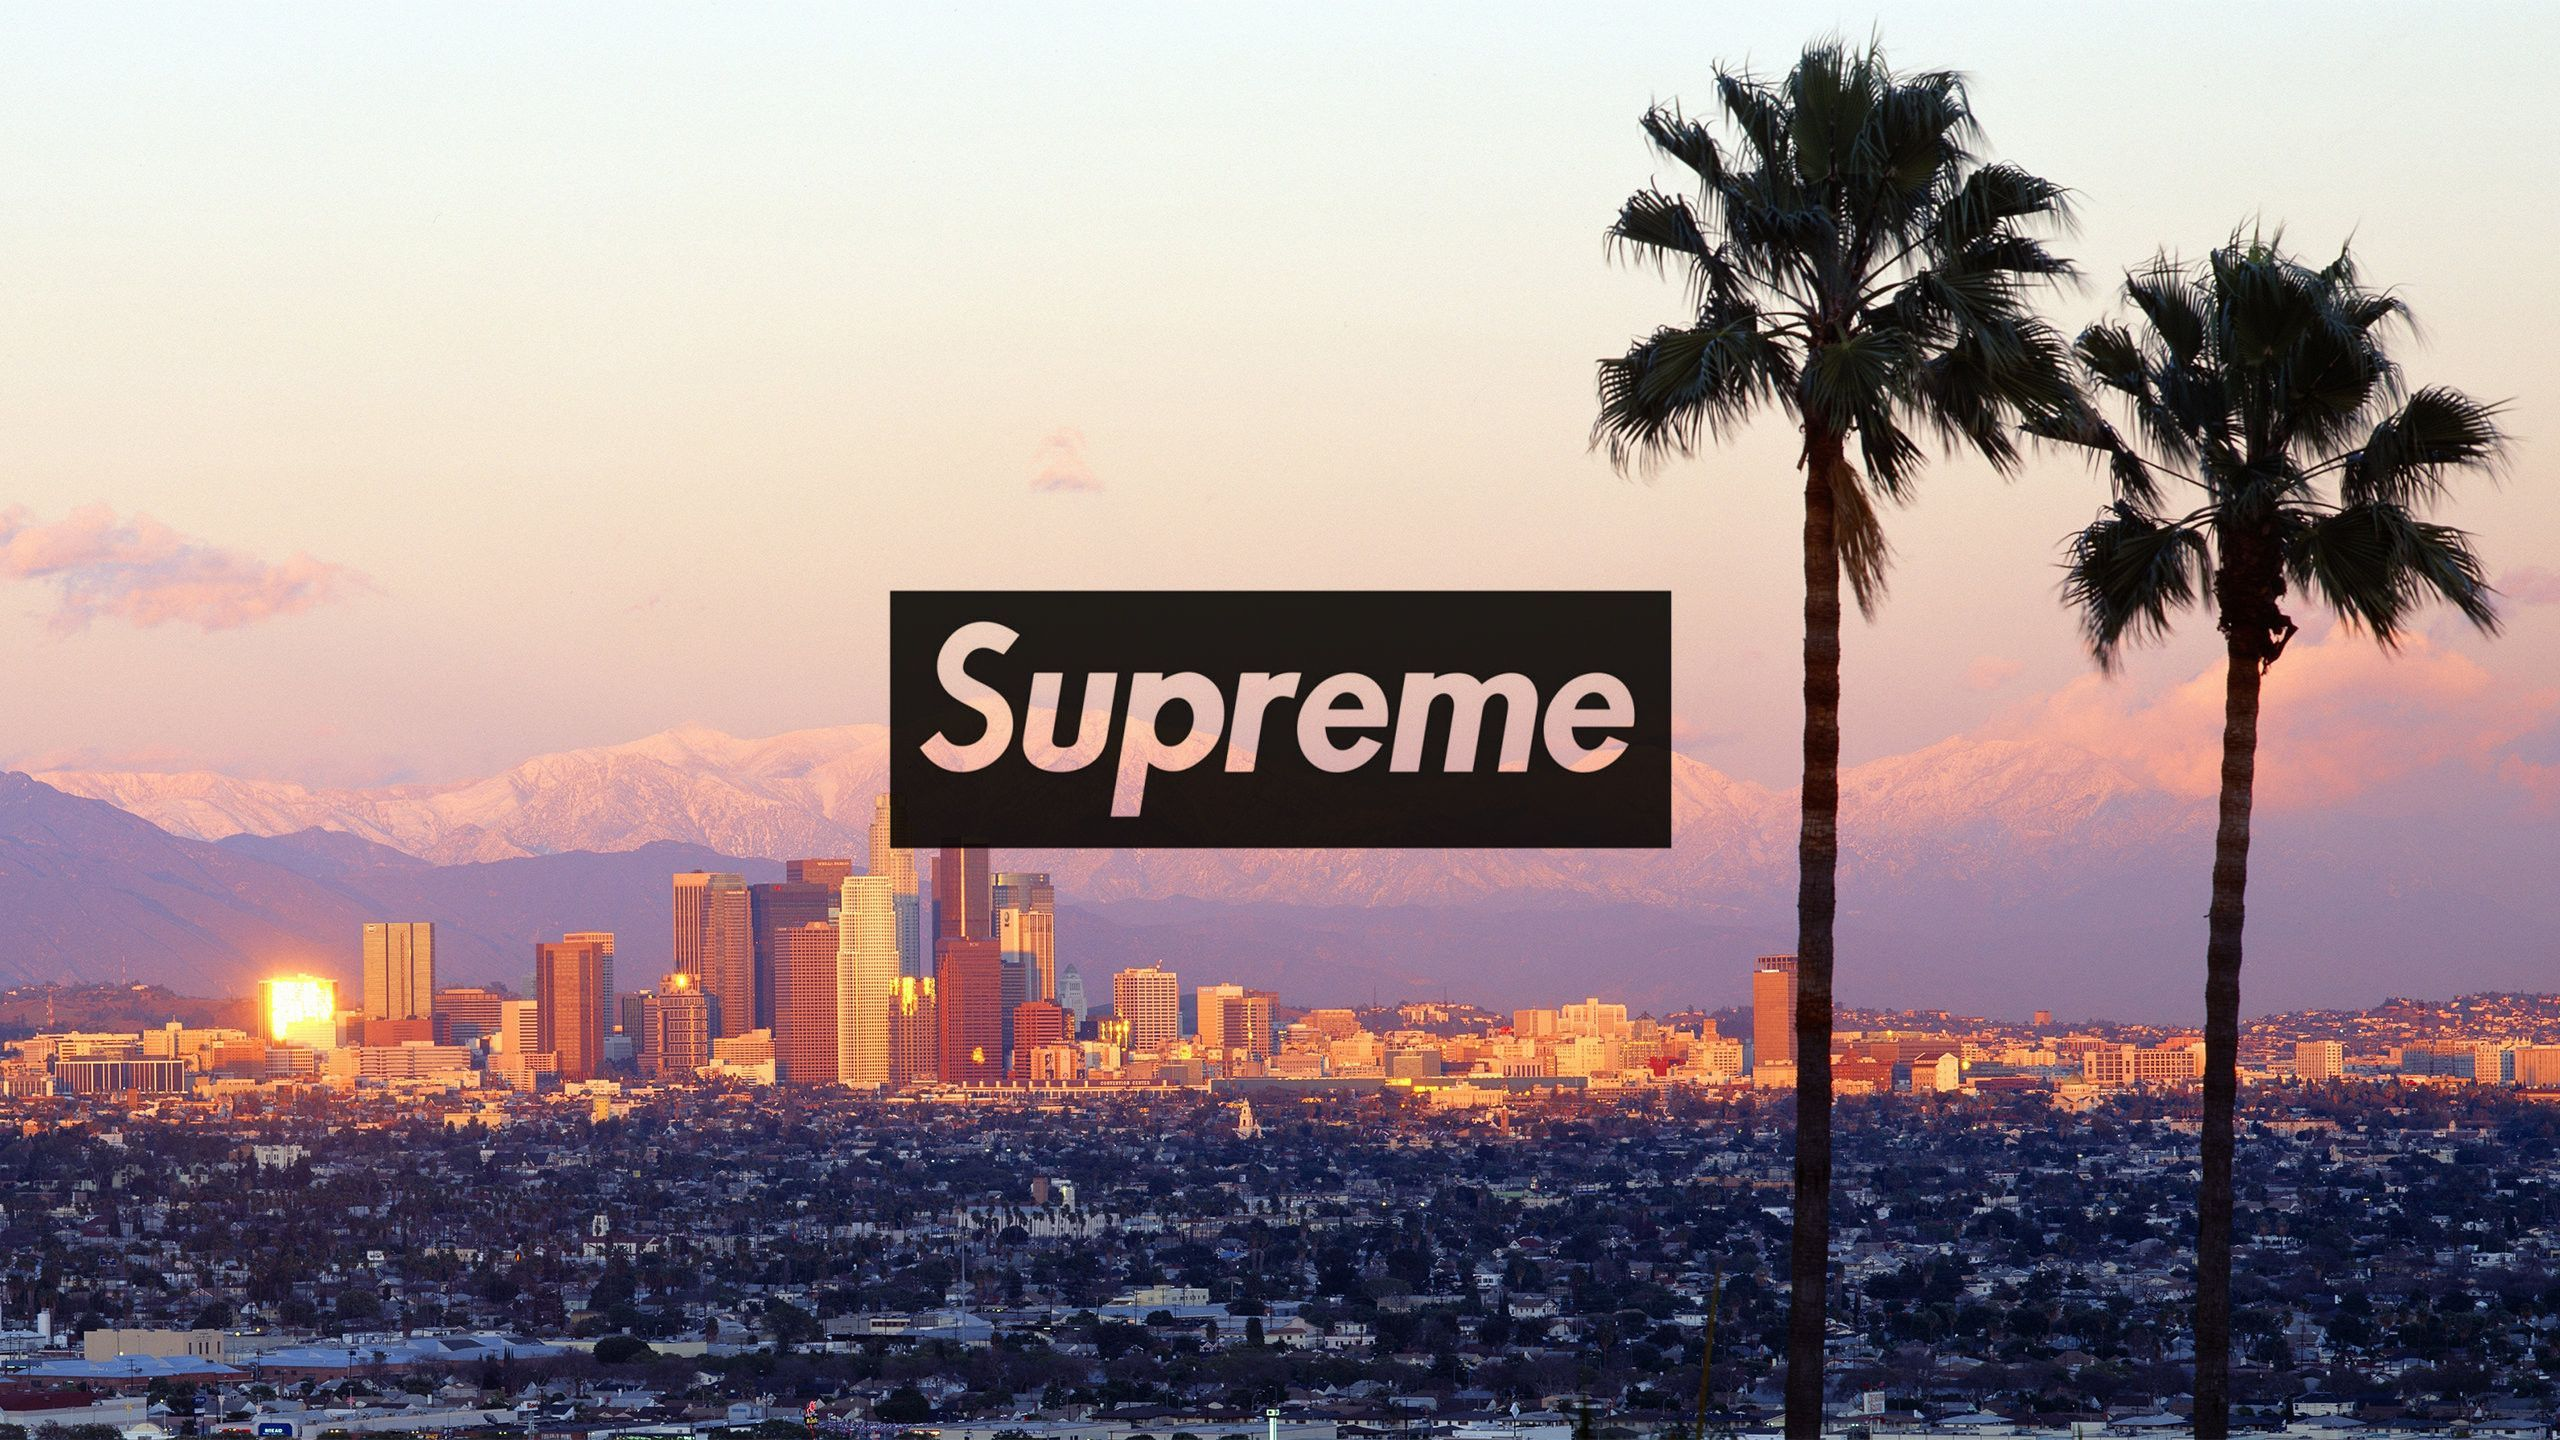 Supreme Mac Wallpapers - Top Free ...